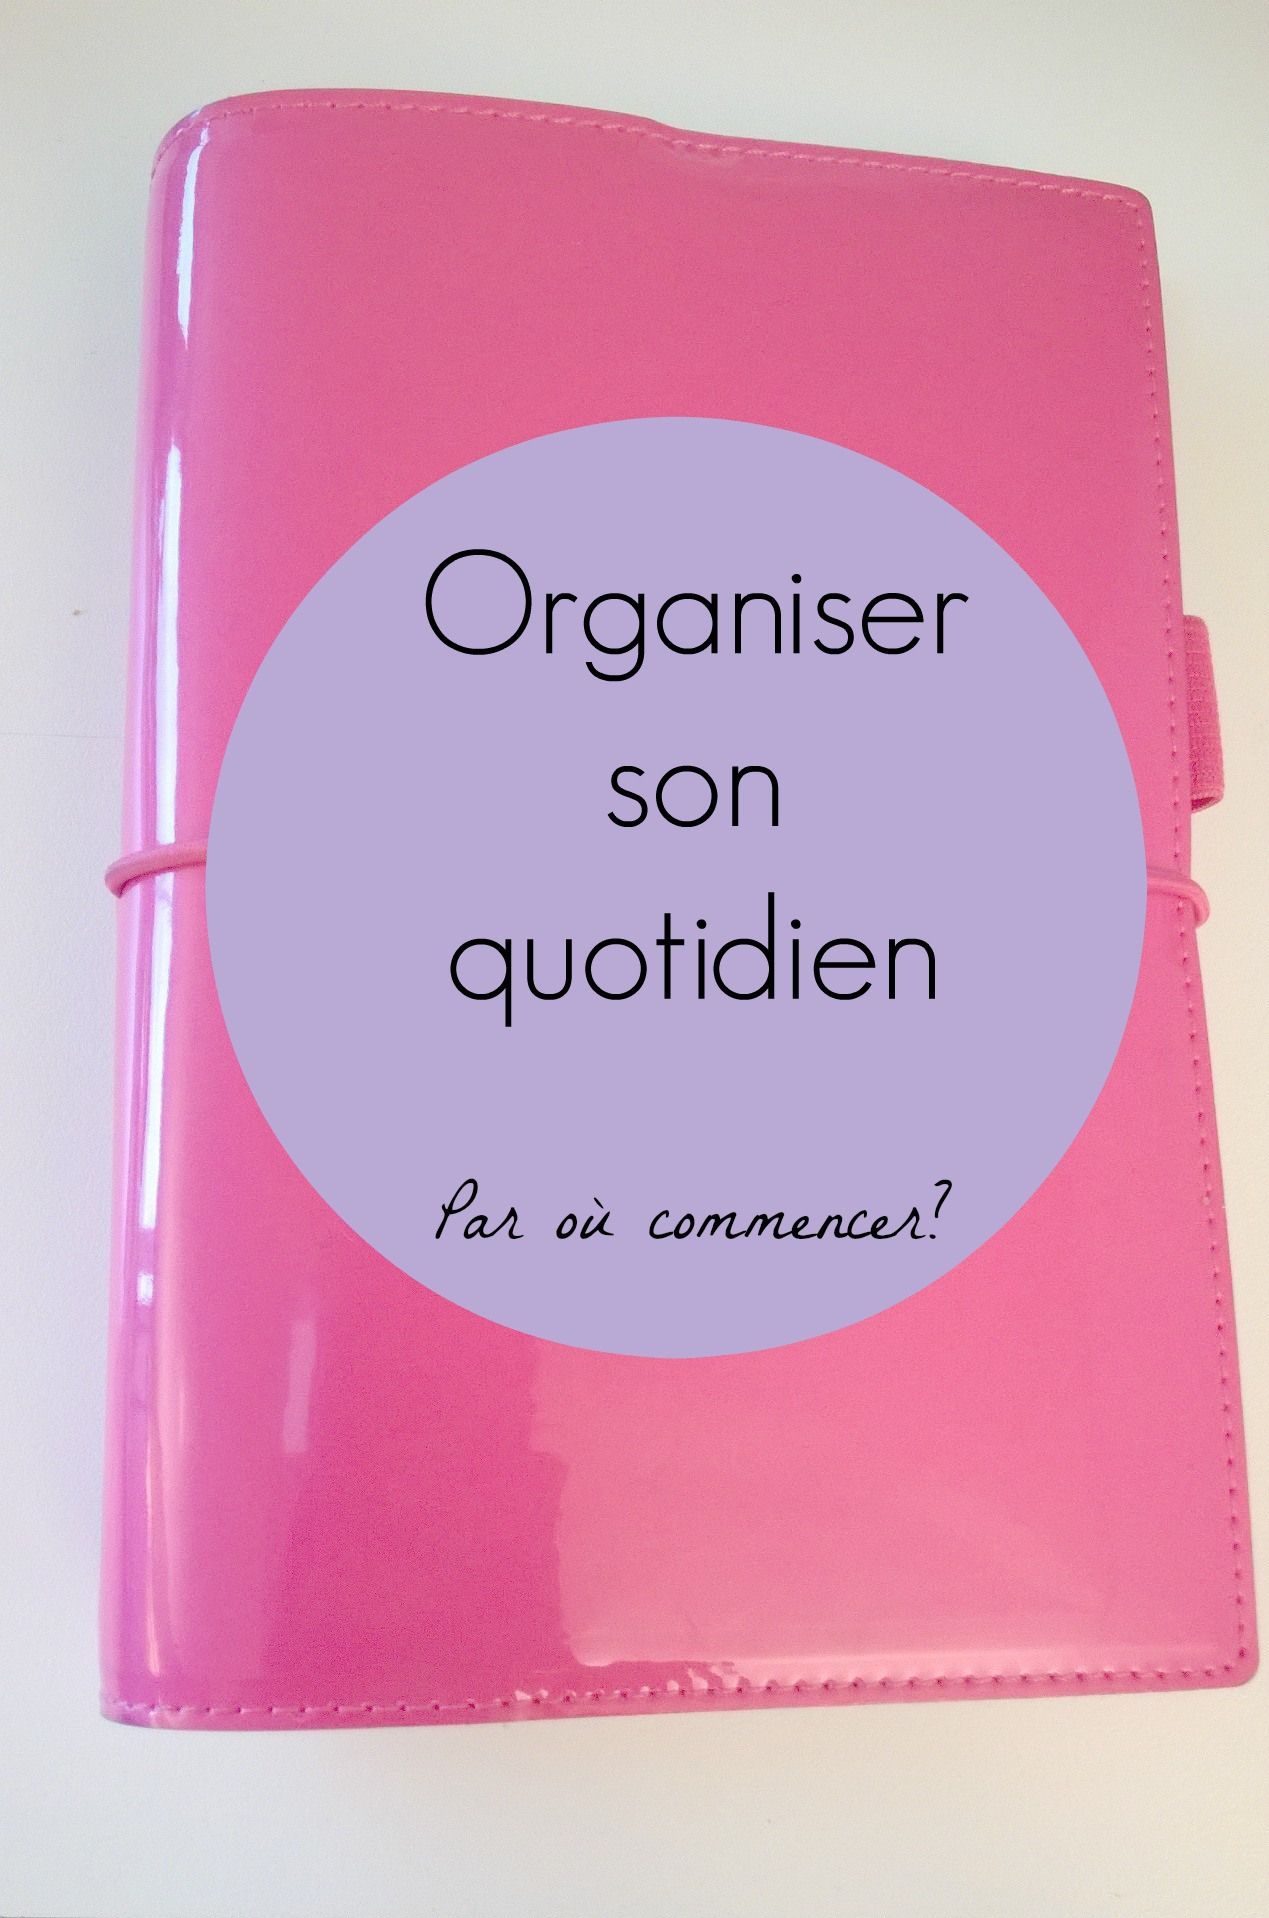 Organiser son quotidien par o commencer sons - Planning organisation menage ...